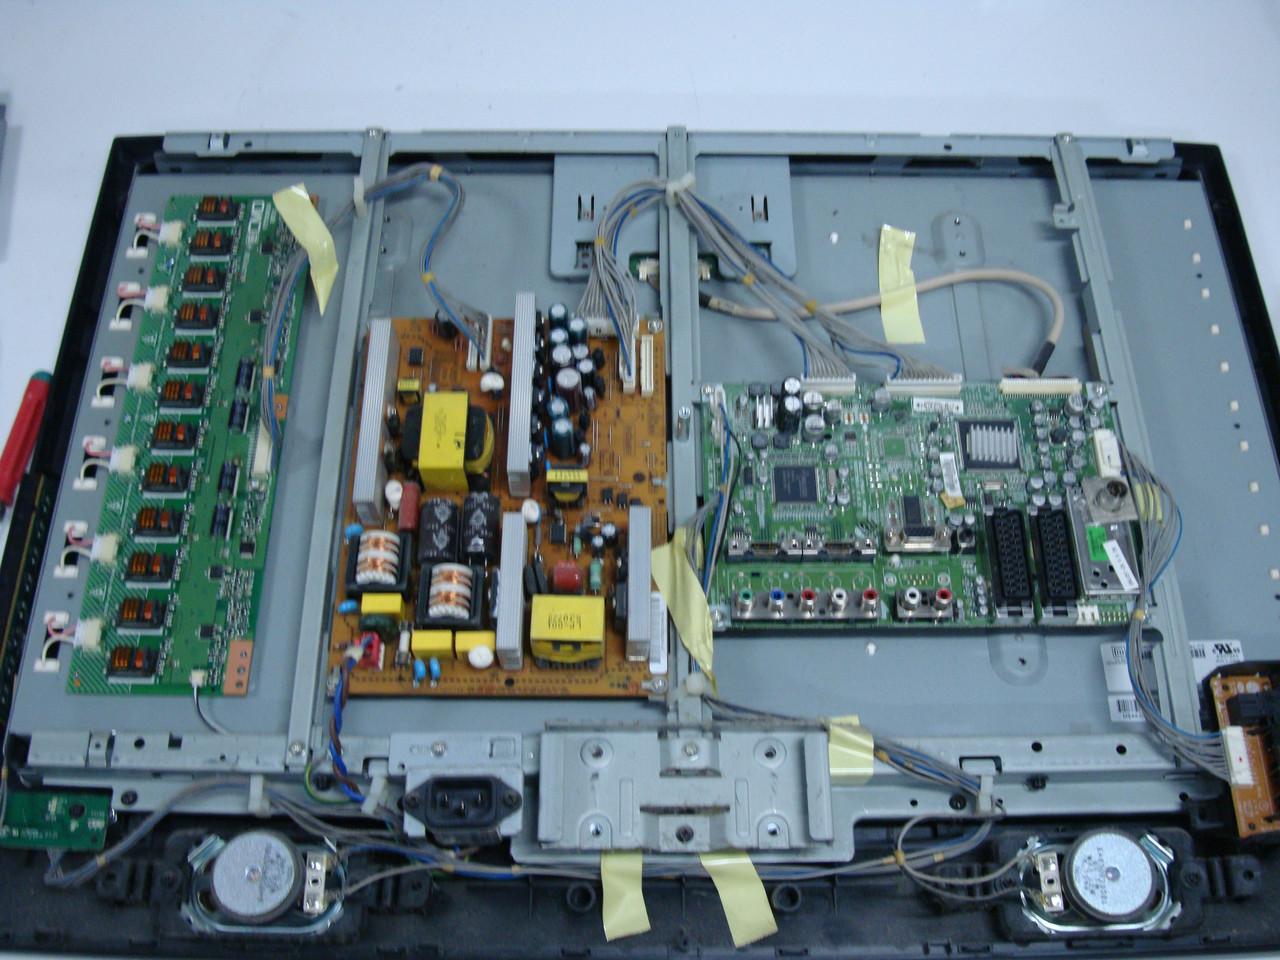 Запчасти к телевизору LG 26LC51 (TCON V260B1-C03, VIT70038.50 REV.3, RCA Eax36298801(1))